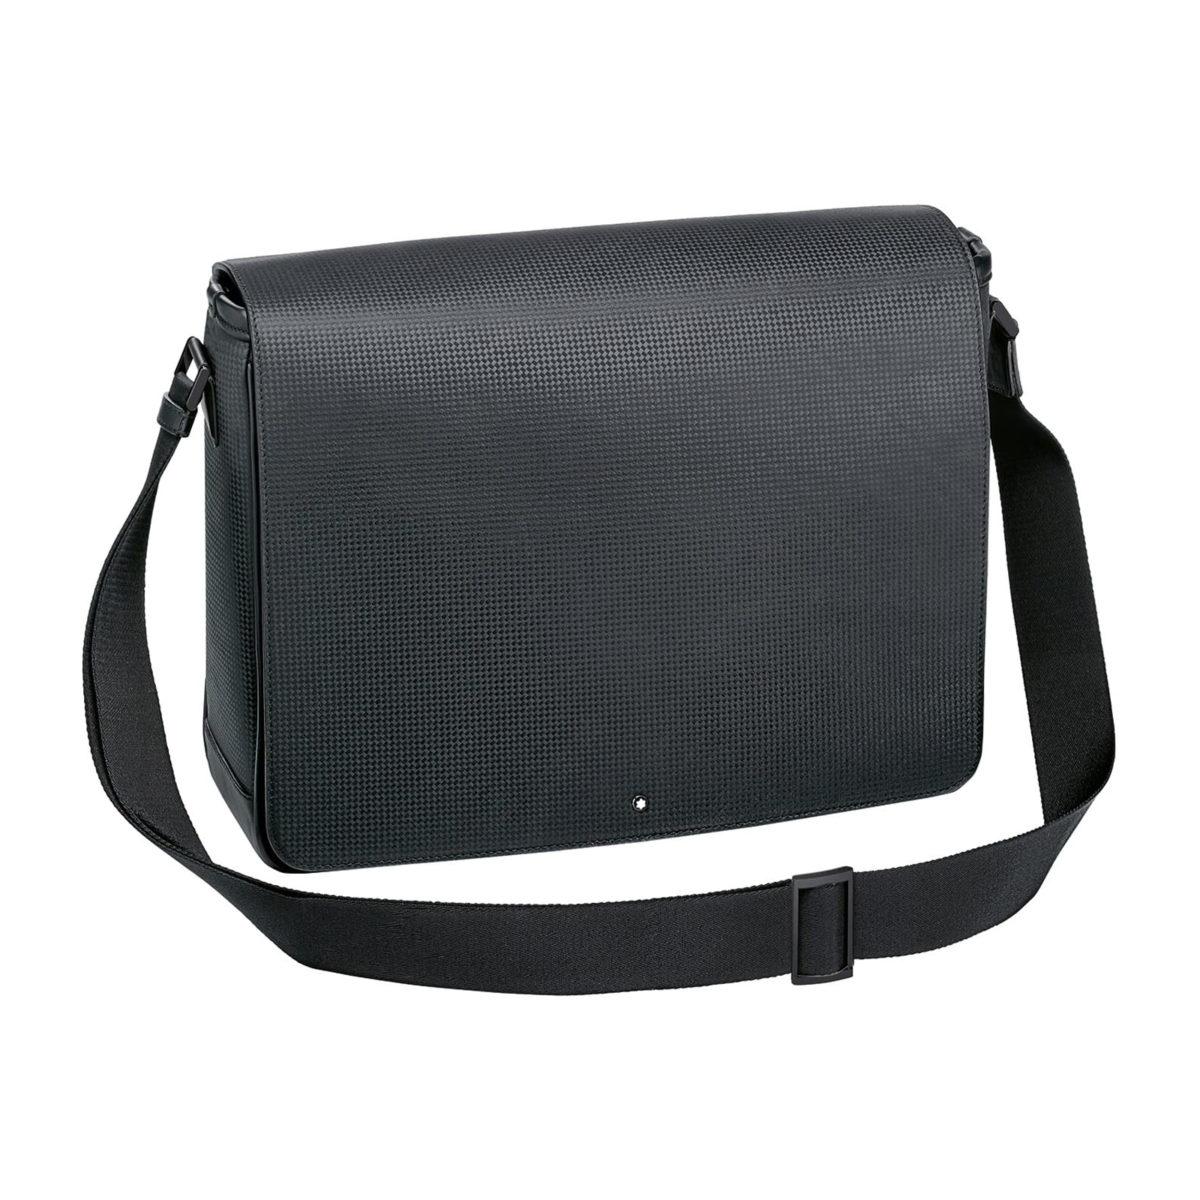 111136 — Montblanc Extreme Messenger Bag Black